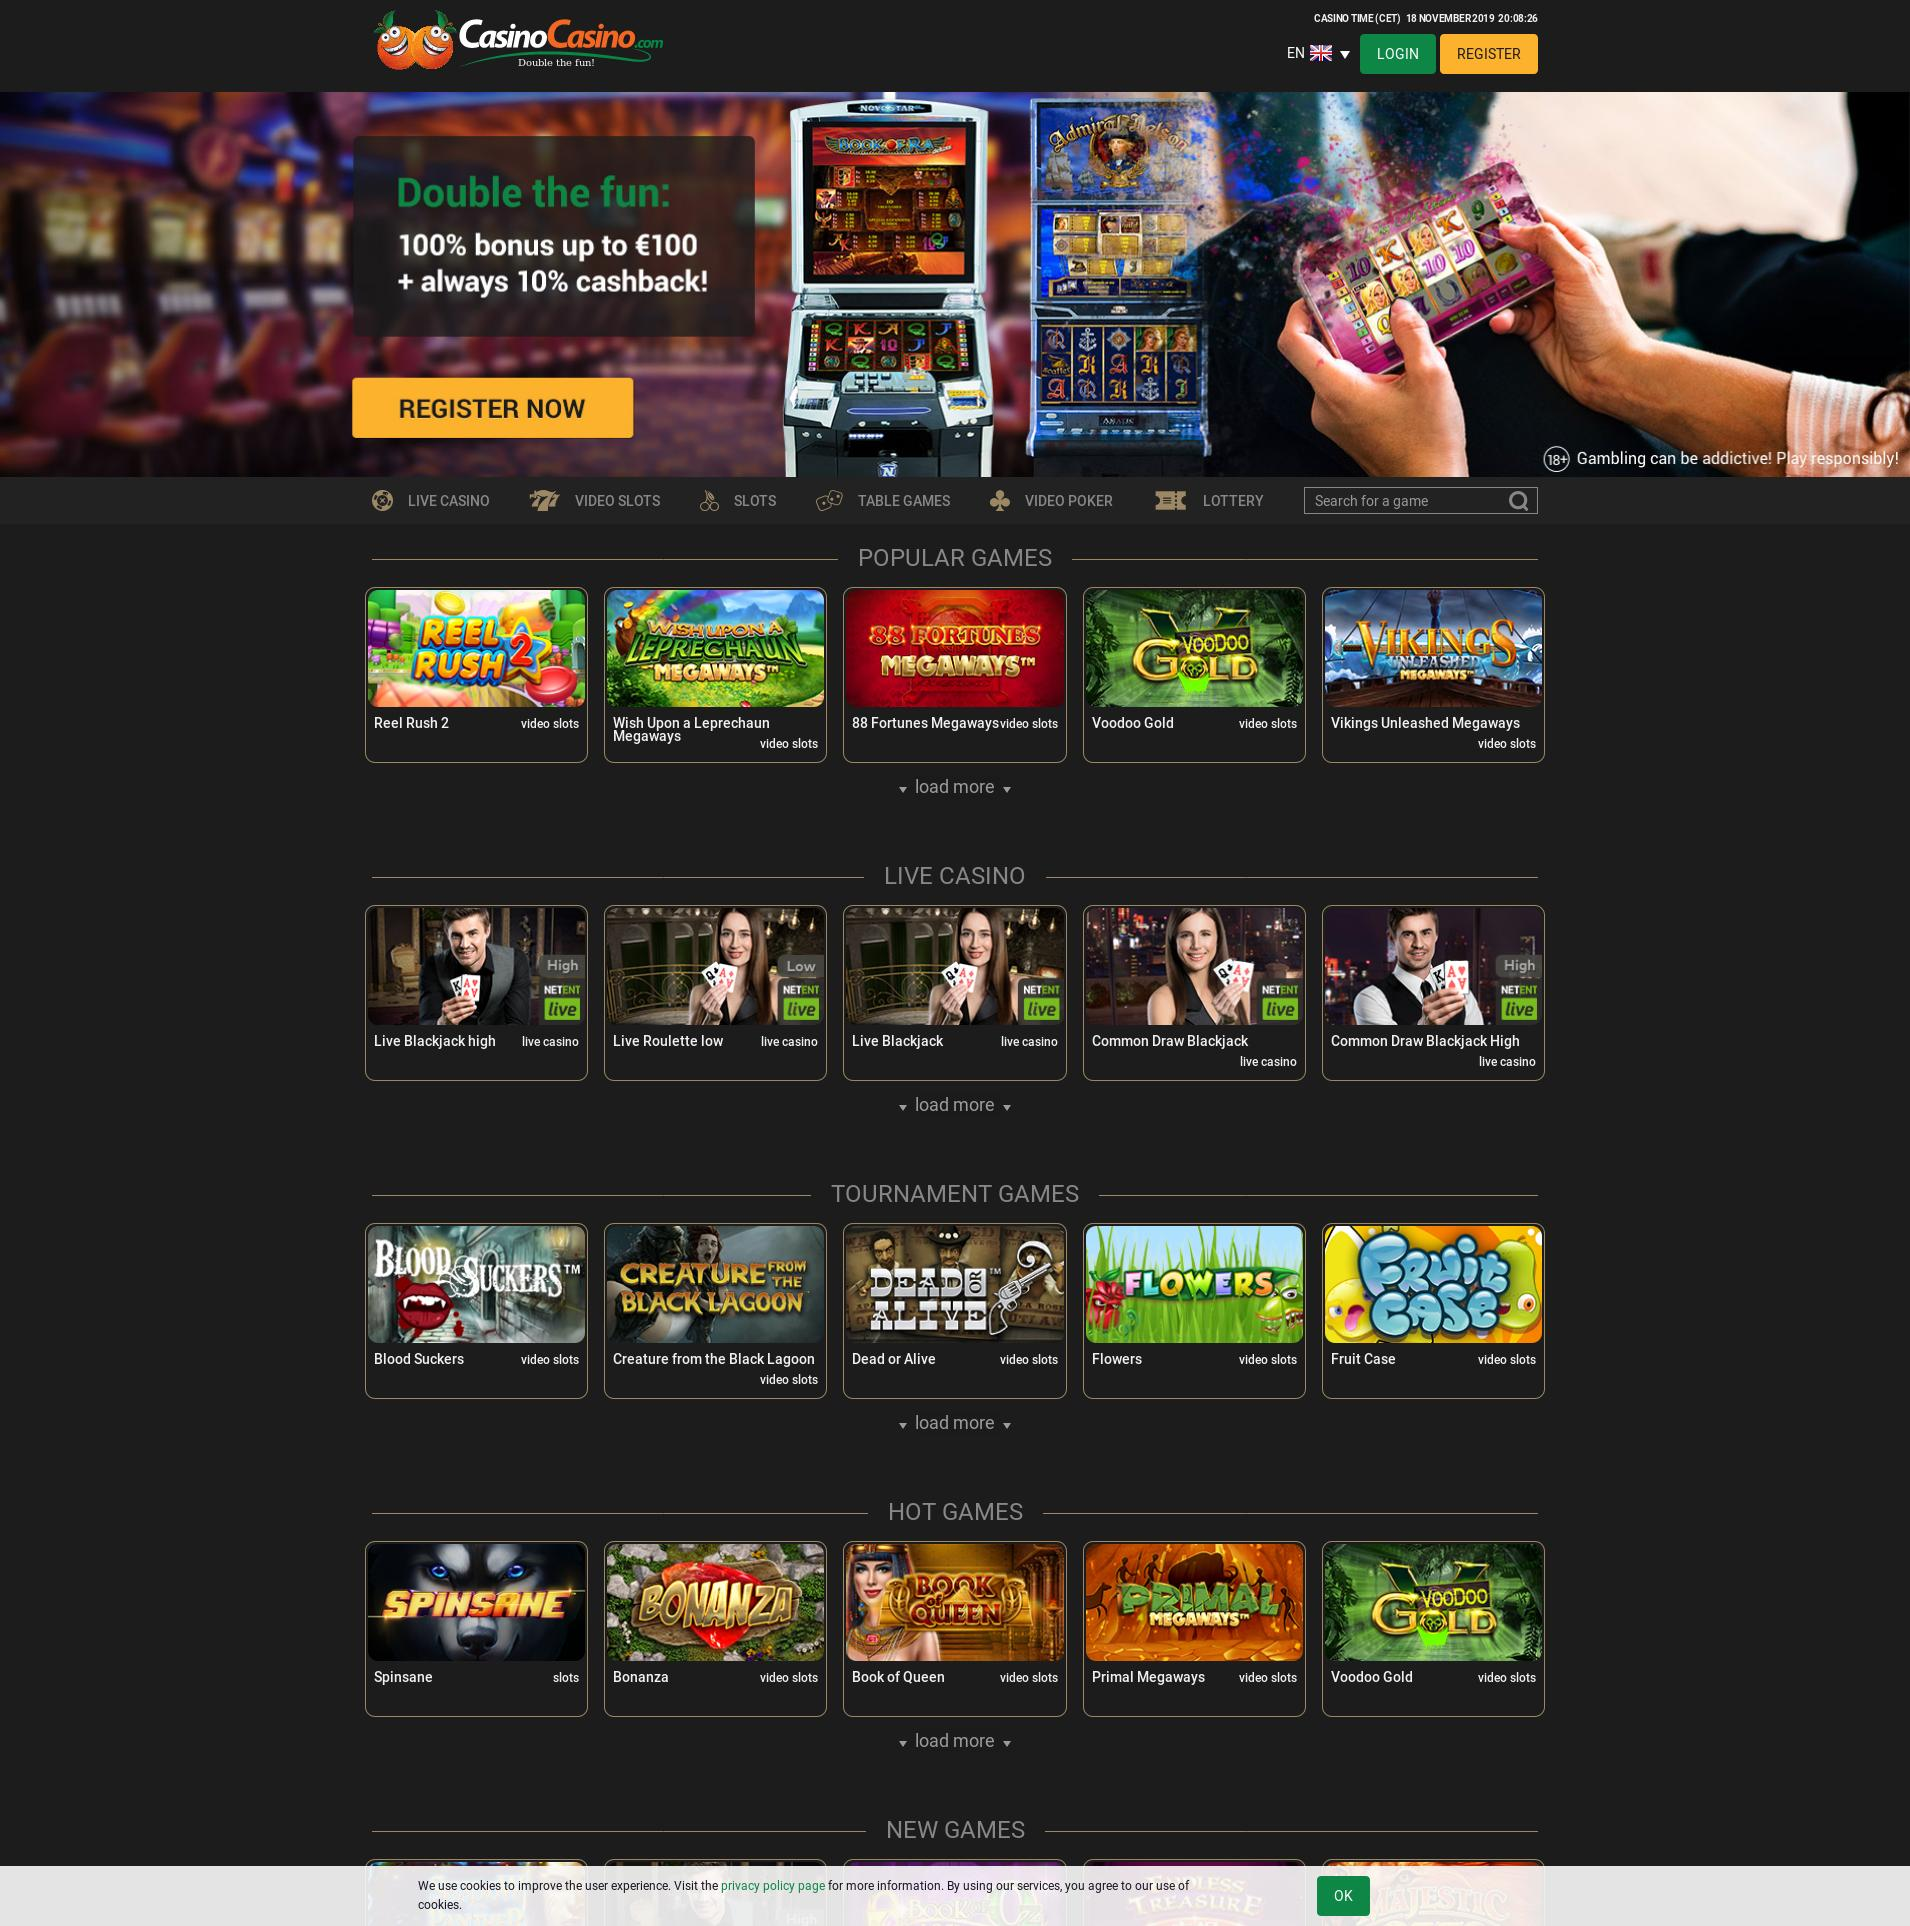 Casino skärm Lobby 2019-11-18 för Norge